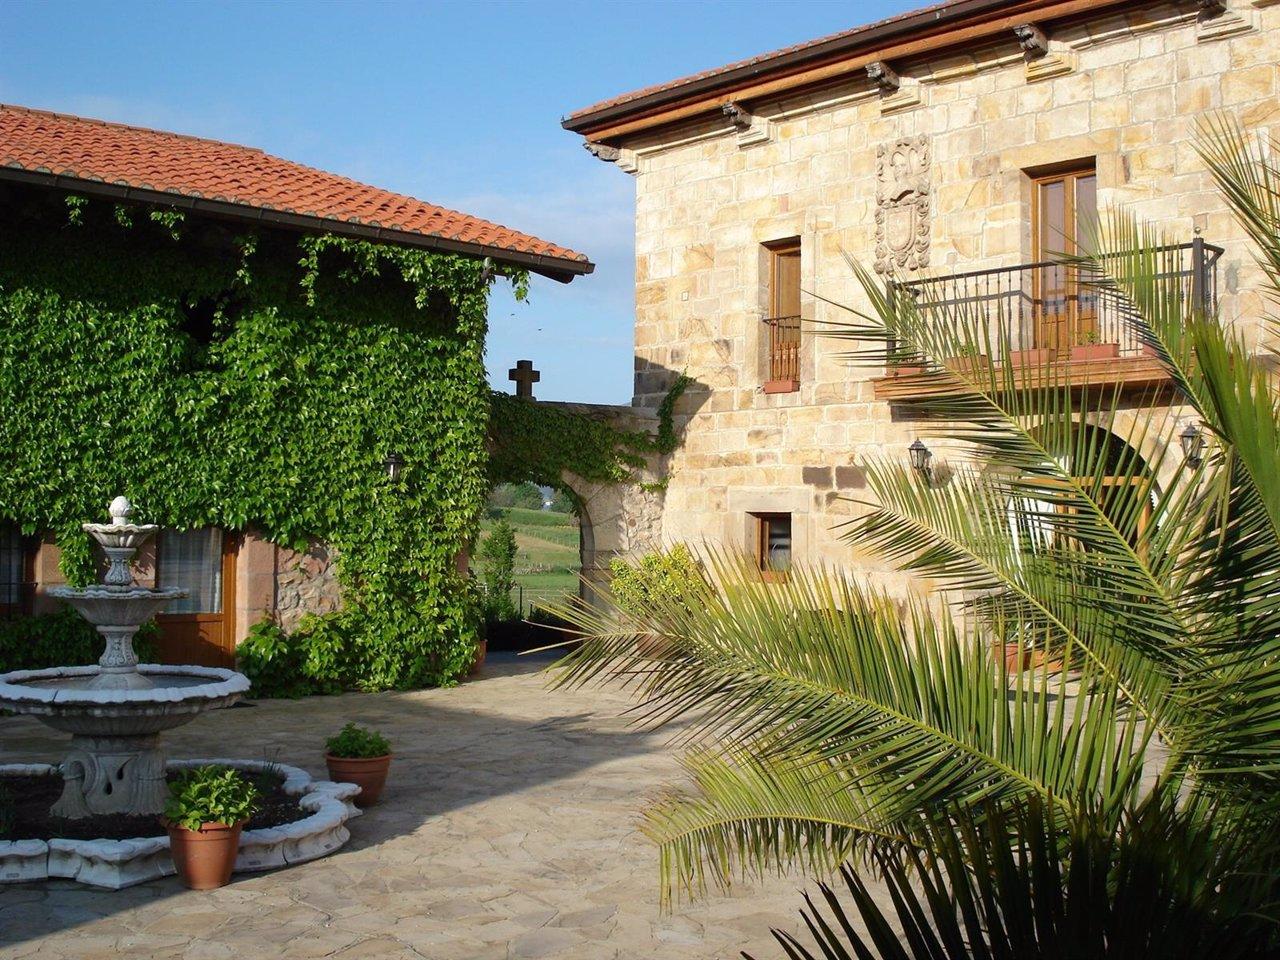 57 hoteles con encanto en madrid selectahotels share the for Hoteles encanto madrid